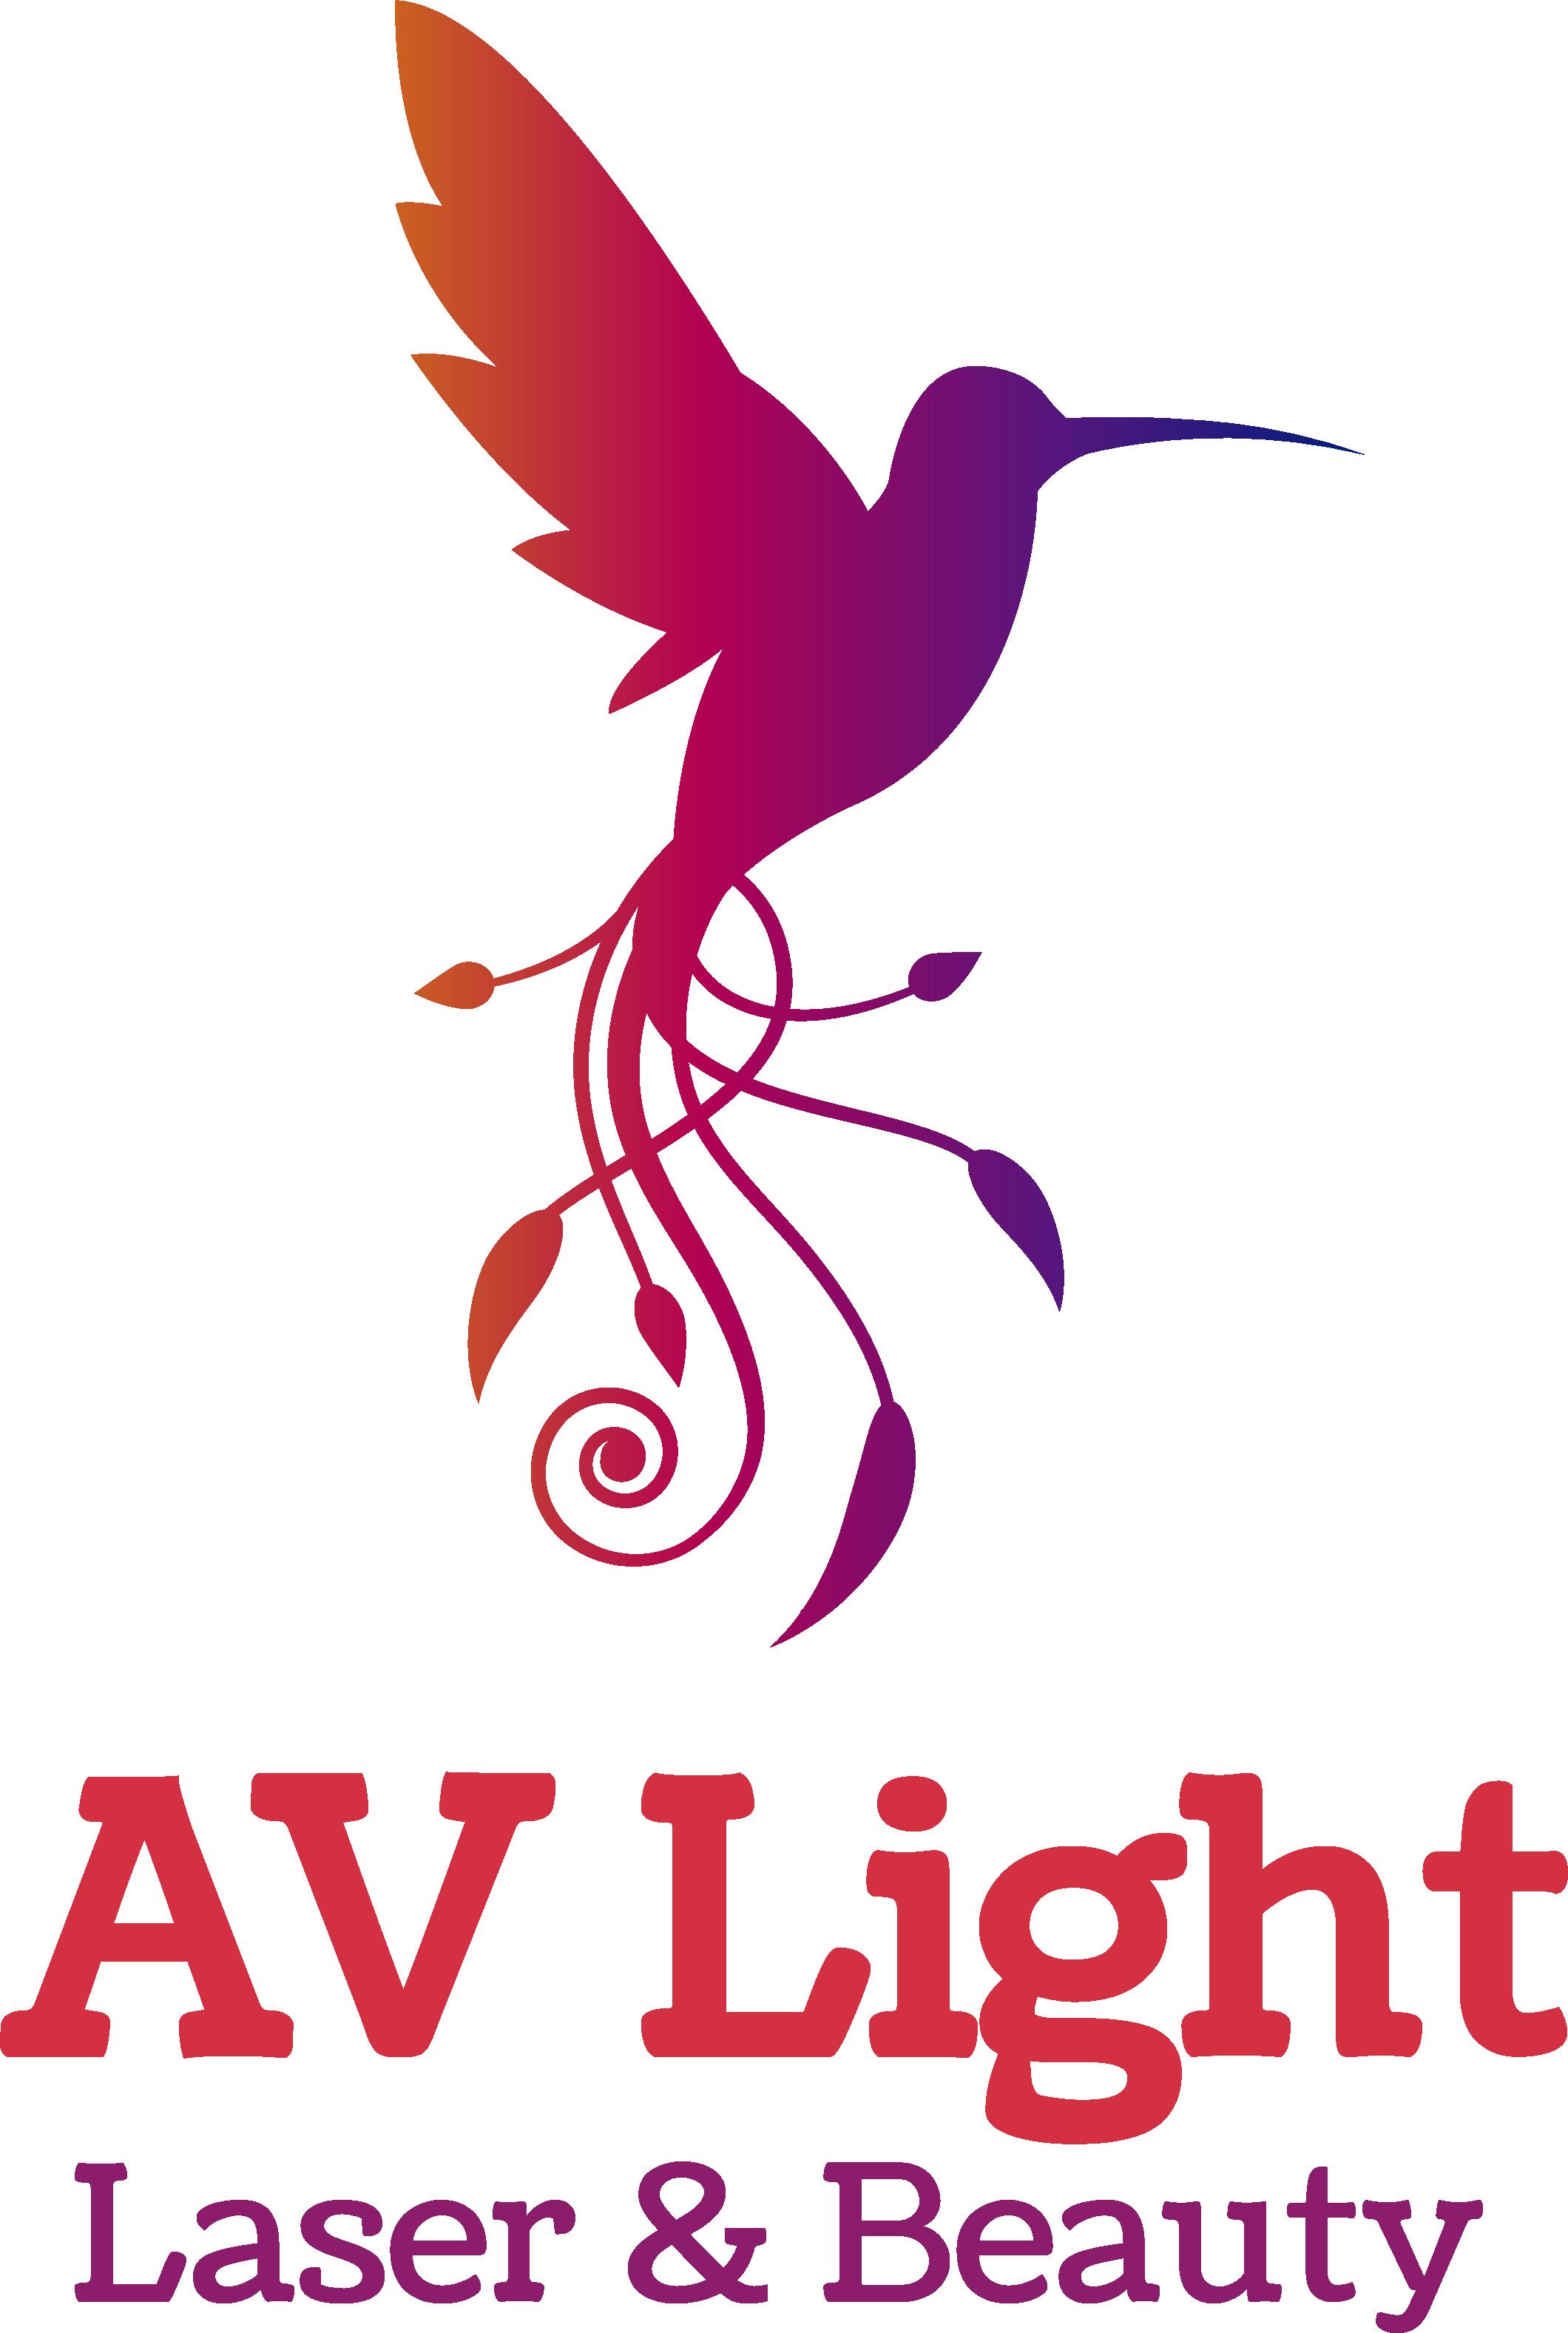 AV Light